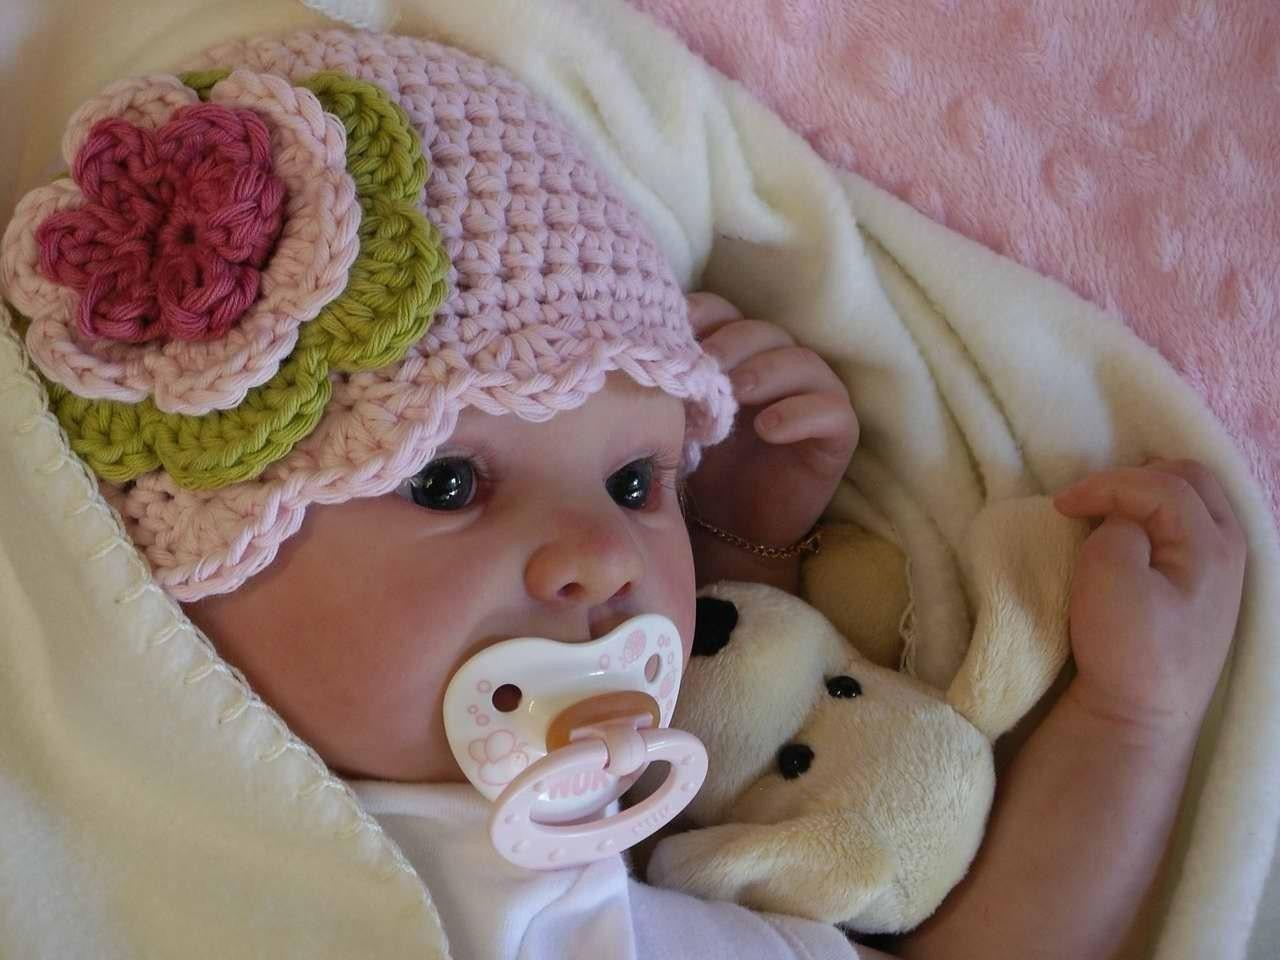 Easy Peasy Crochet Hat Patterns : Easy Peasy Shell Trim Baby Hat Crochet Pattern by ...